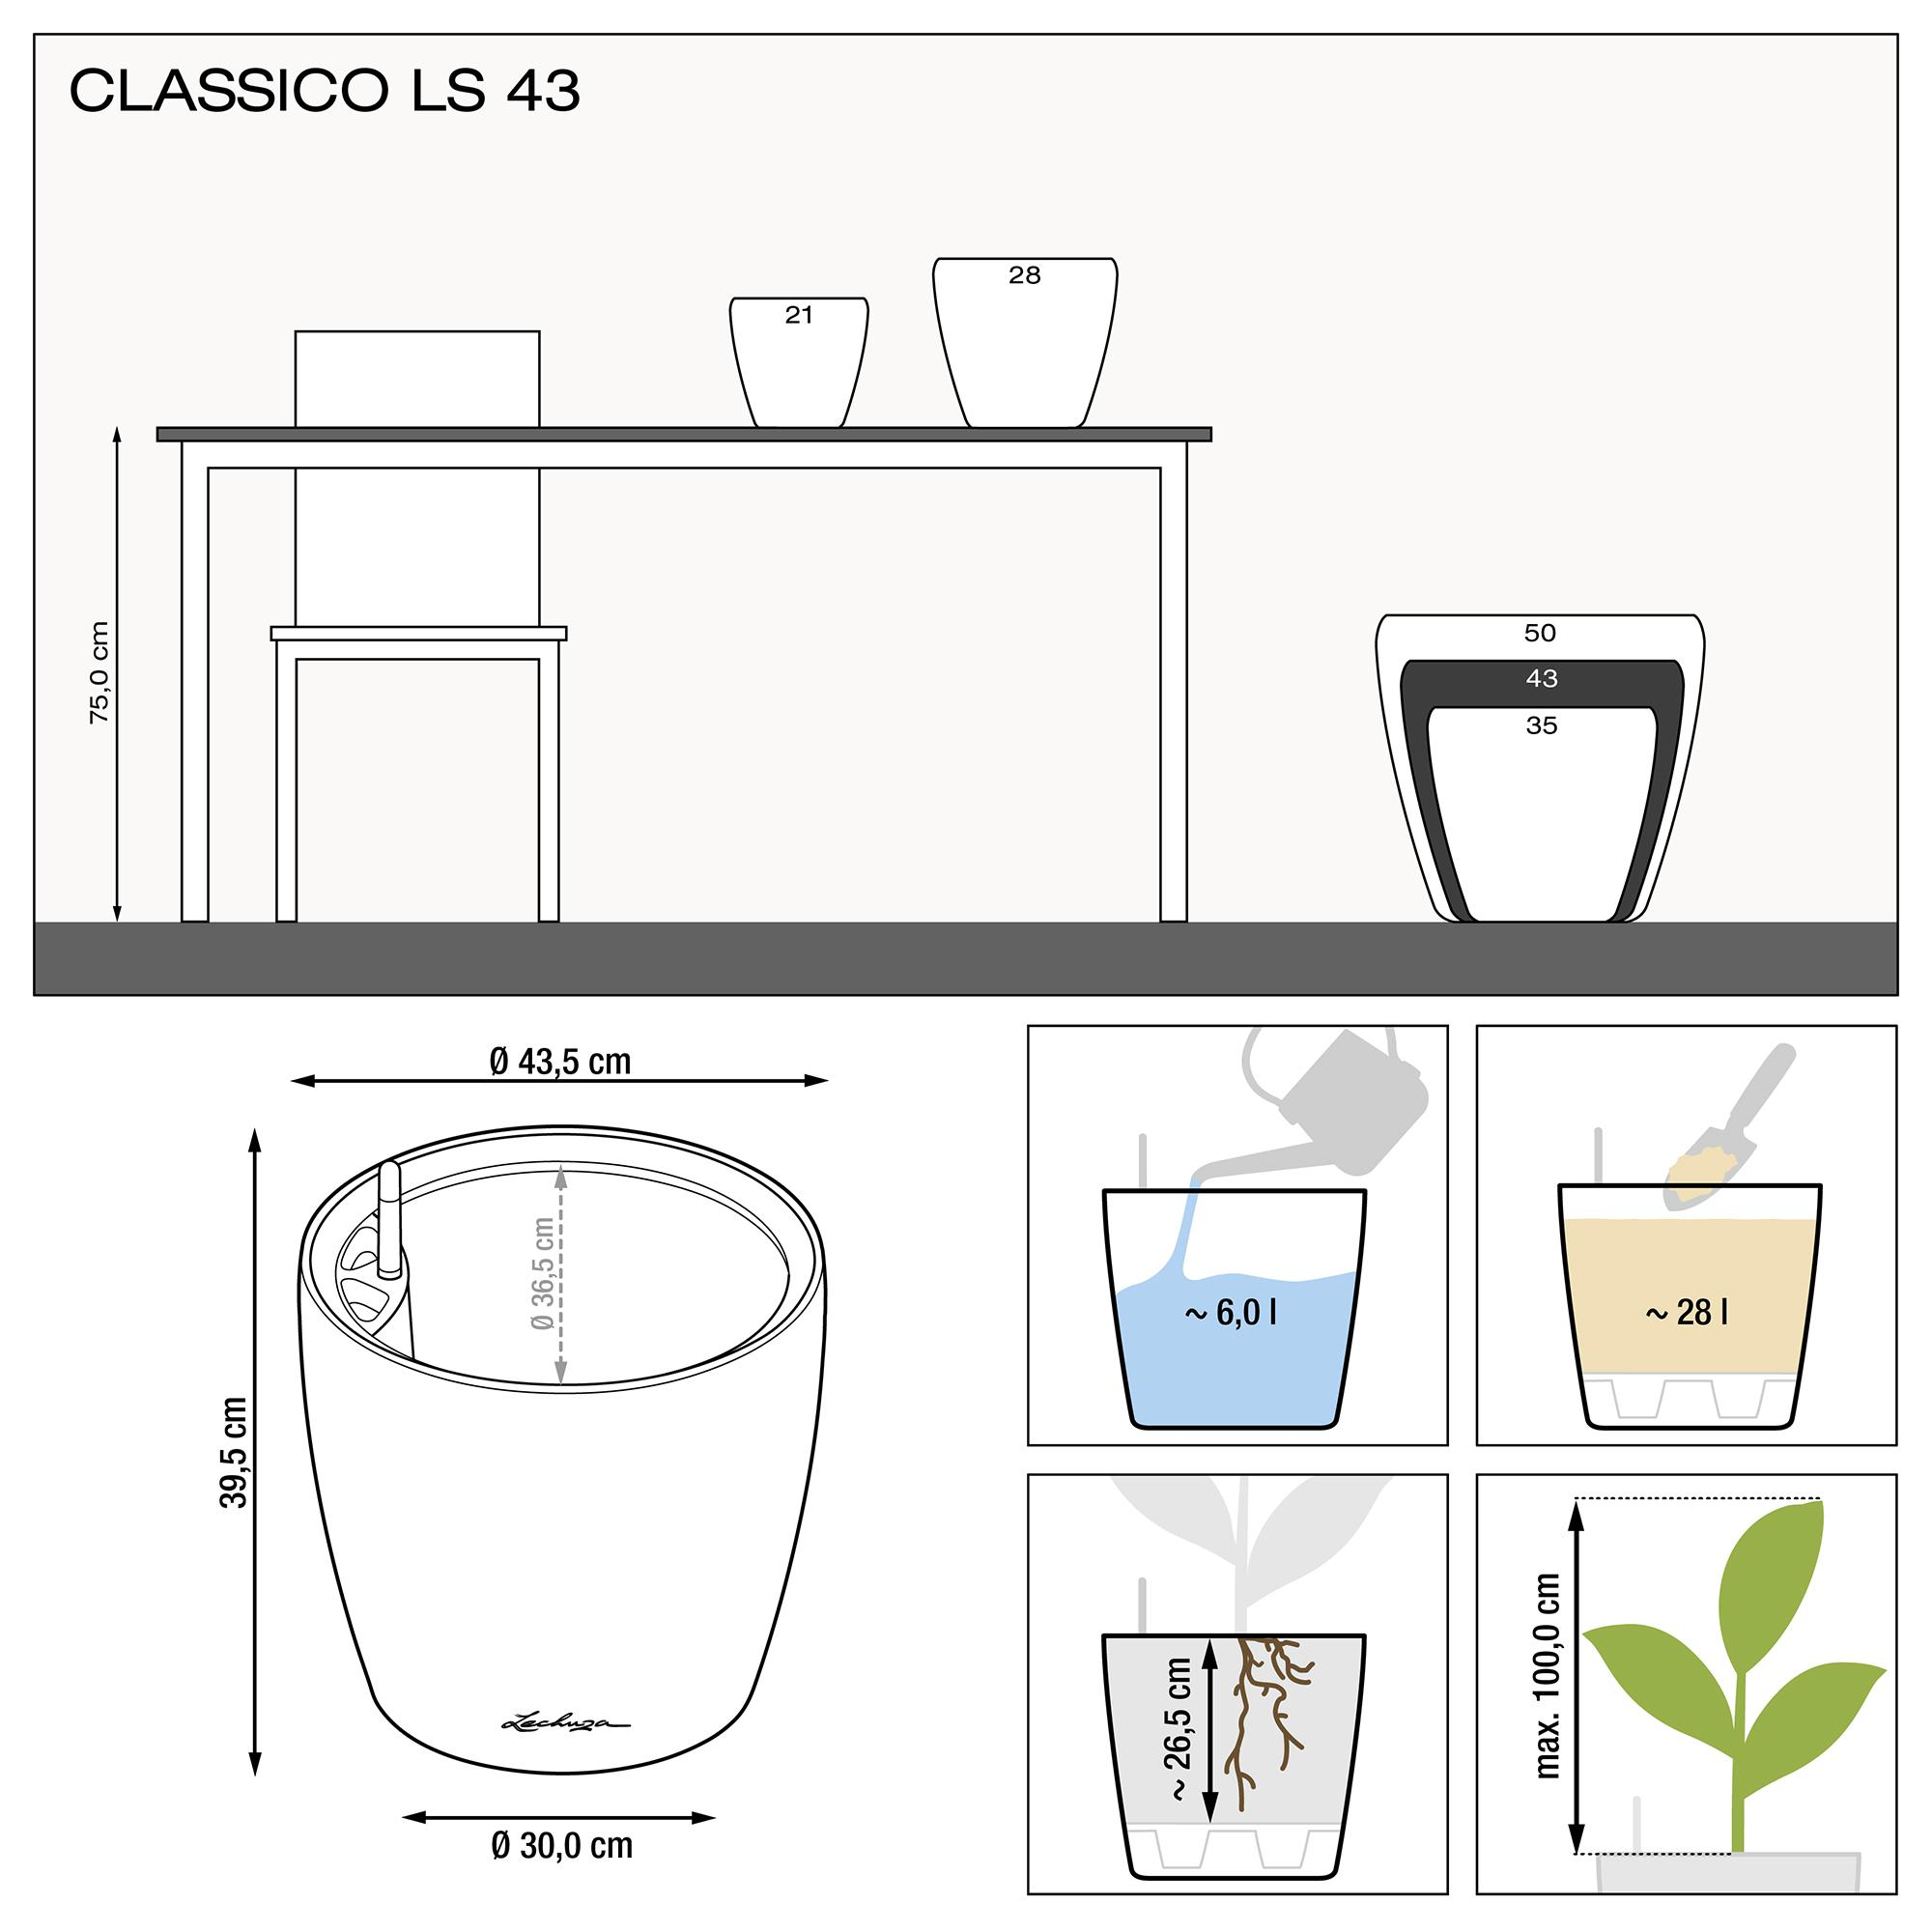 CLASSICO LS 43 black high-gloss - Image 3